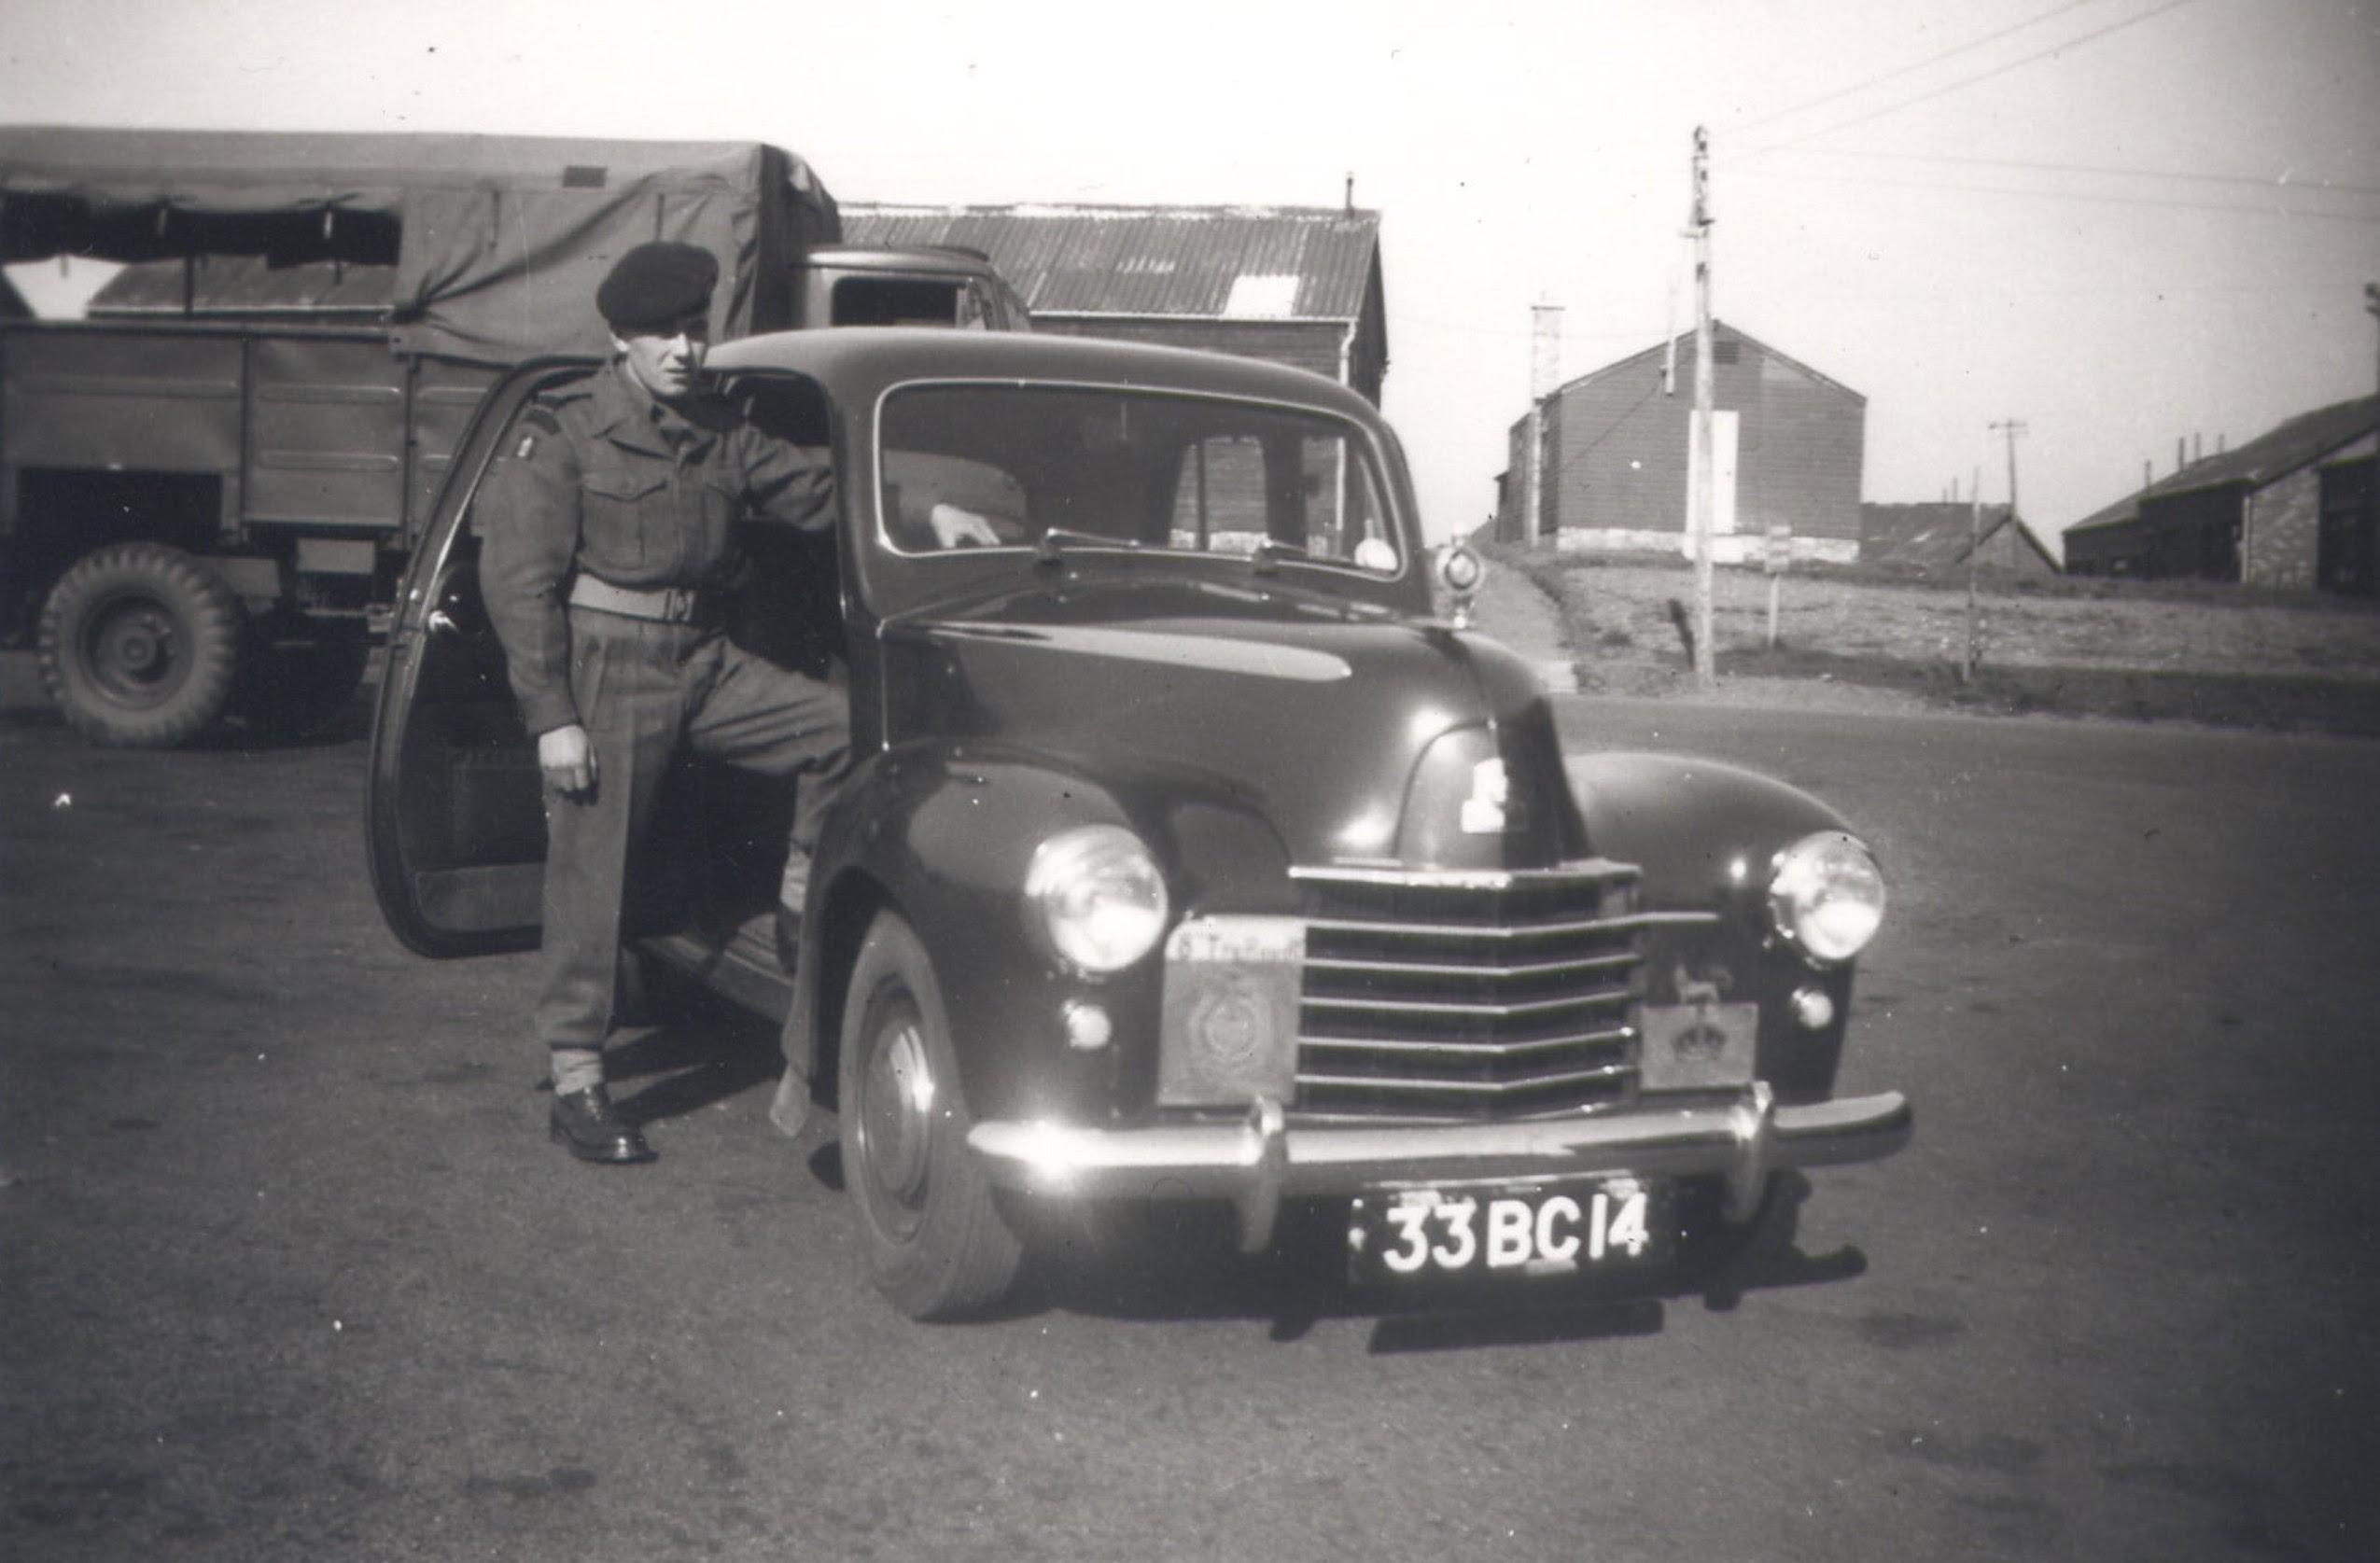 Vauxhall Wyvern Staff Car (33 BC 14)